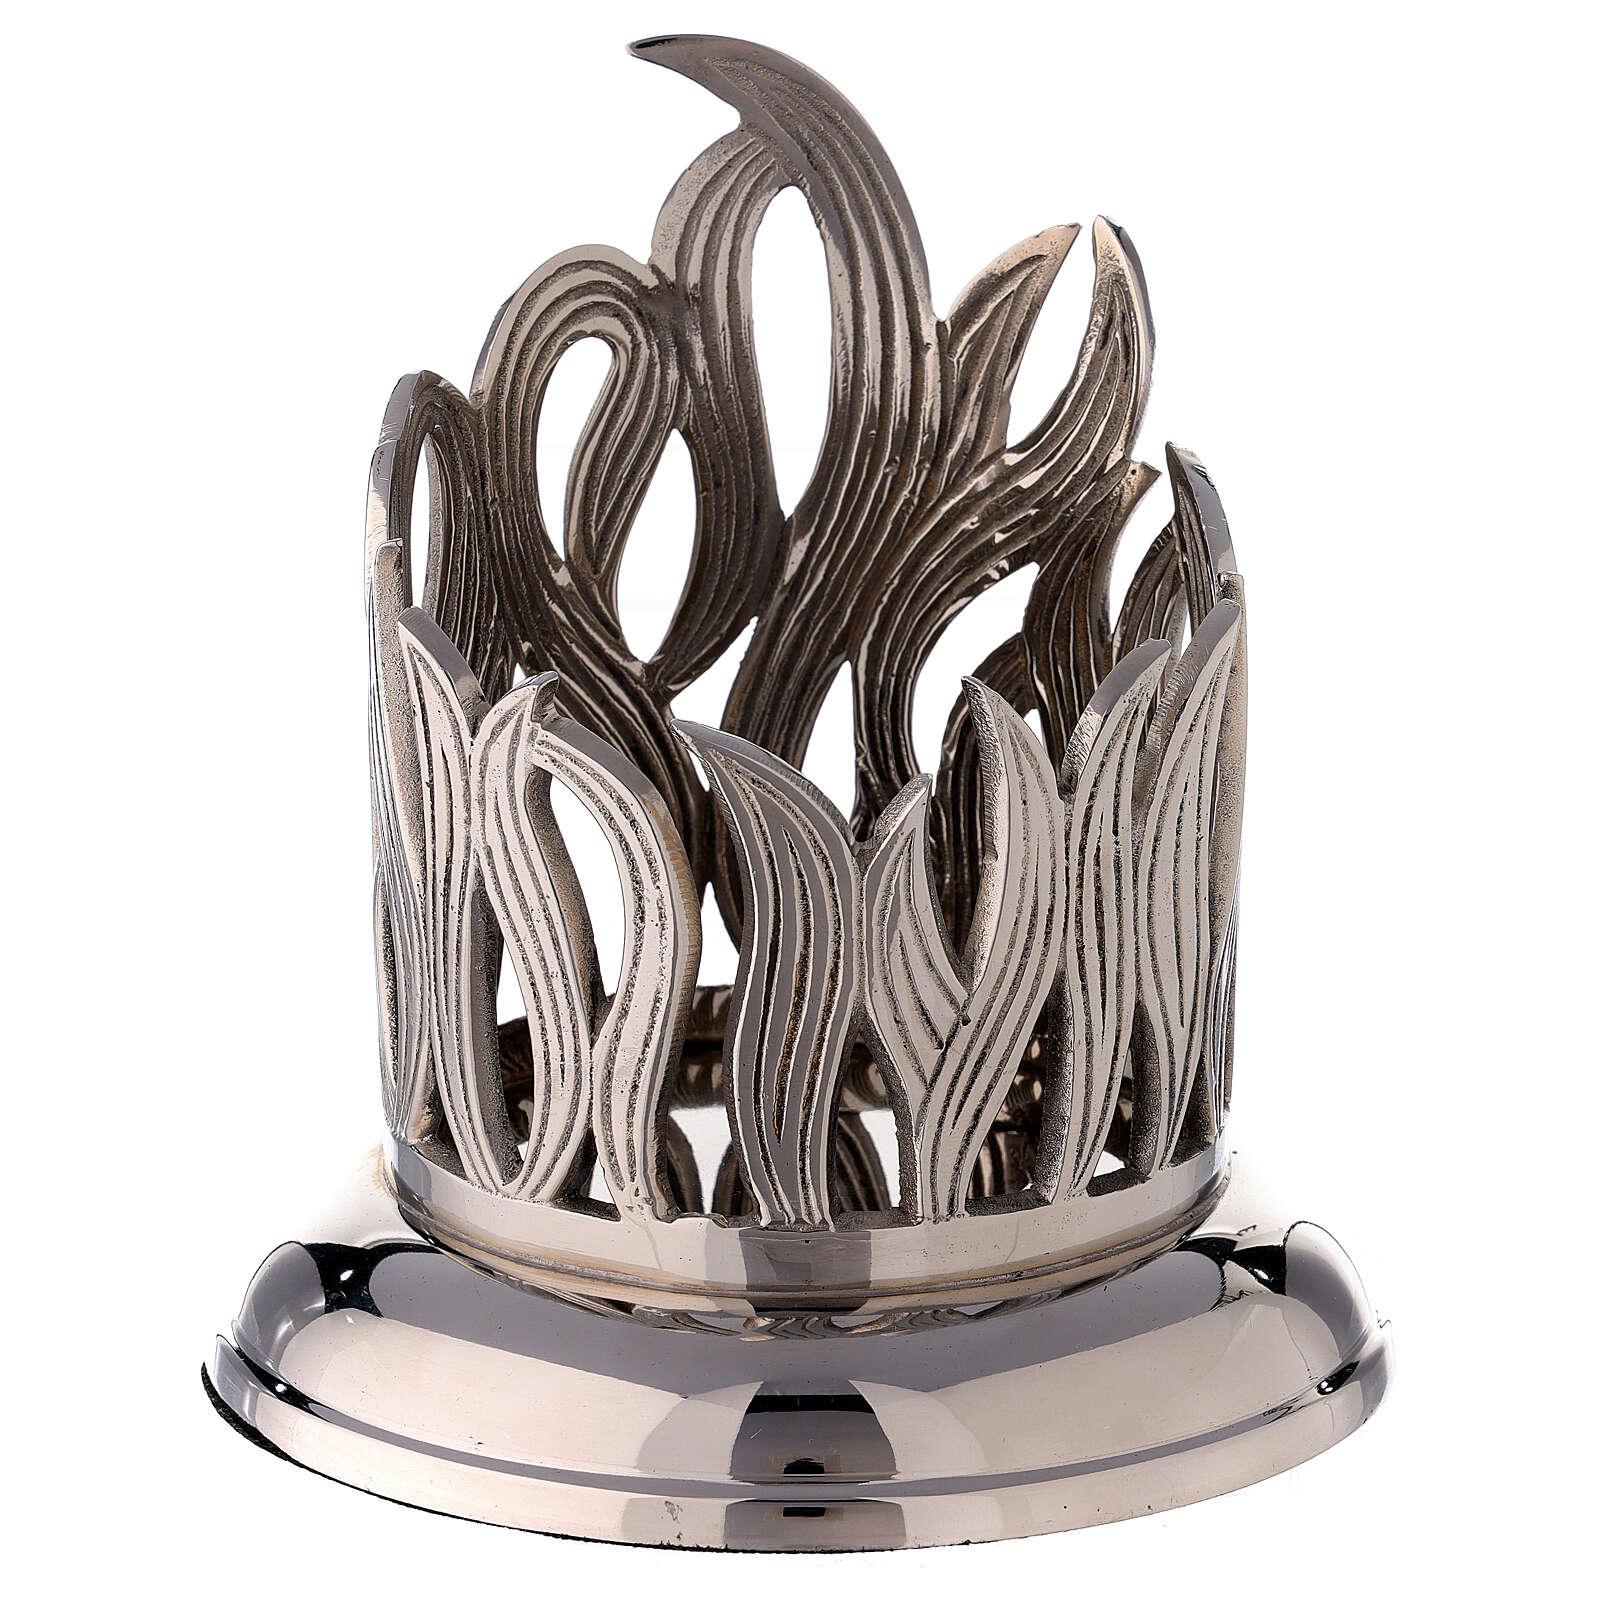 Bougeoir flammes laiton nickelé diam. 10 cm 4